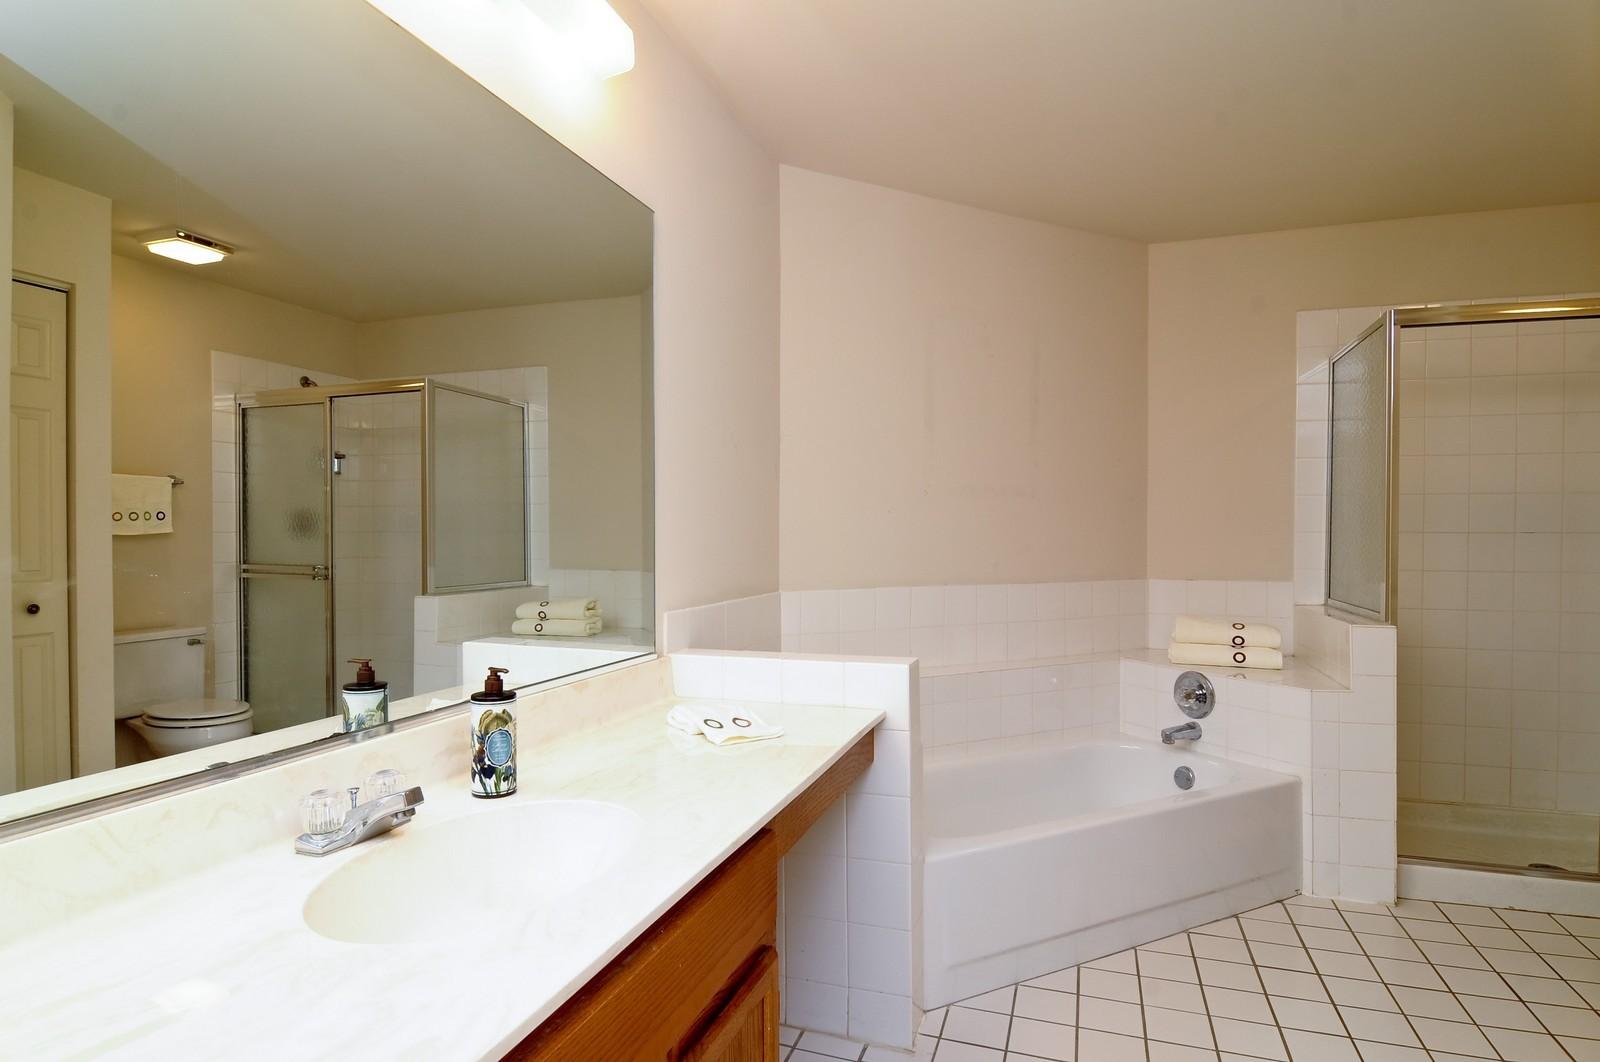 Real Estate Photography - 534A Penny Lane, Crystal Lake, IL, 60014 - Master Bathroom